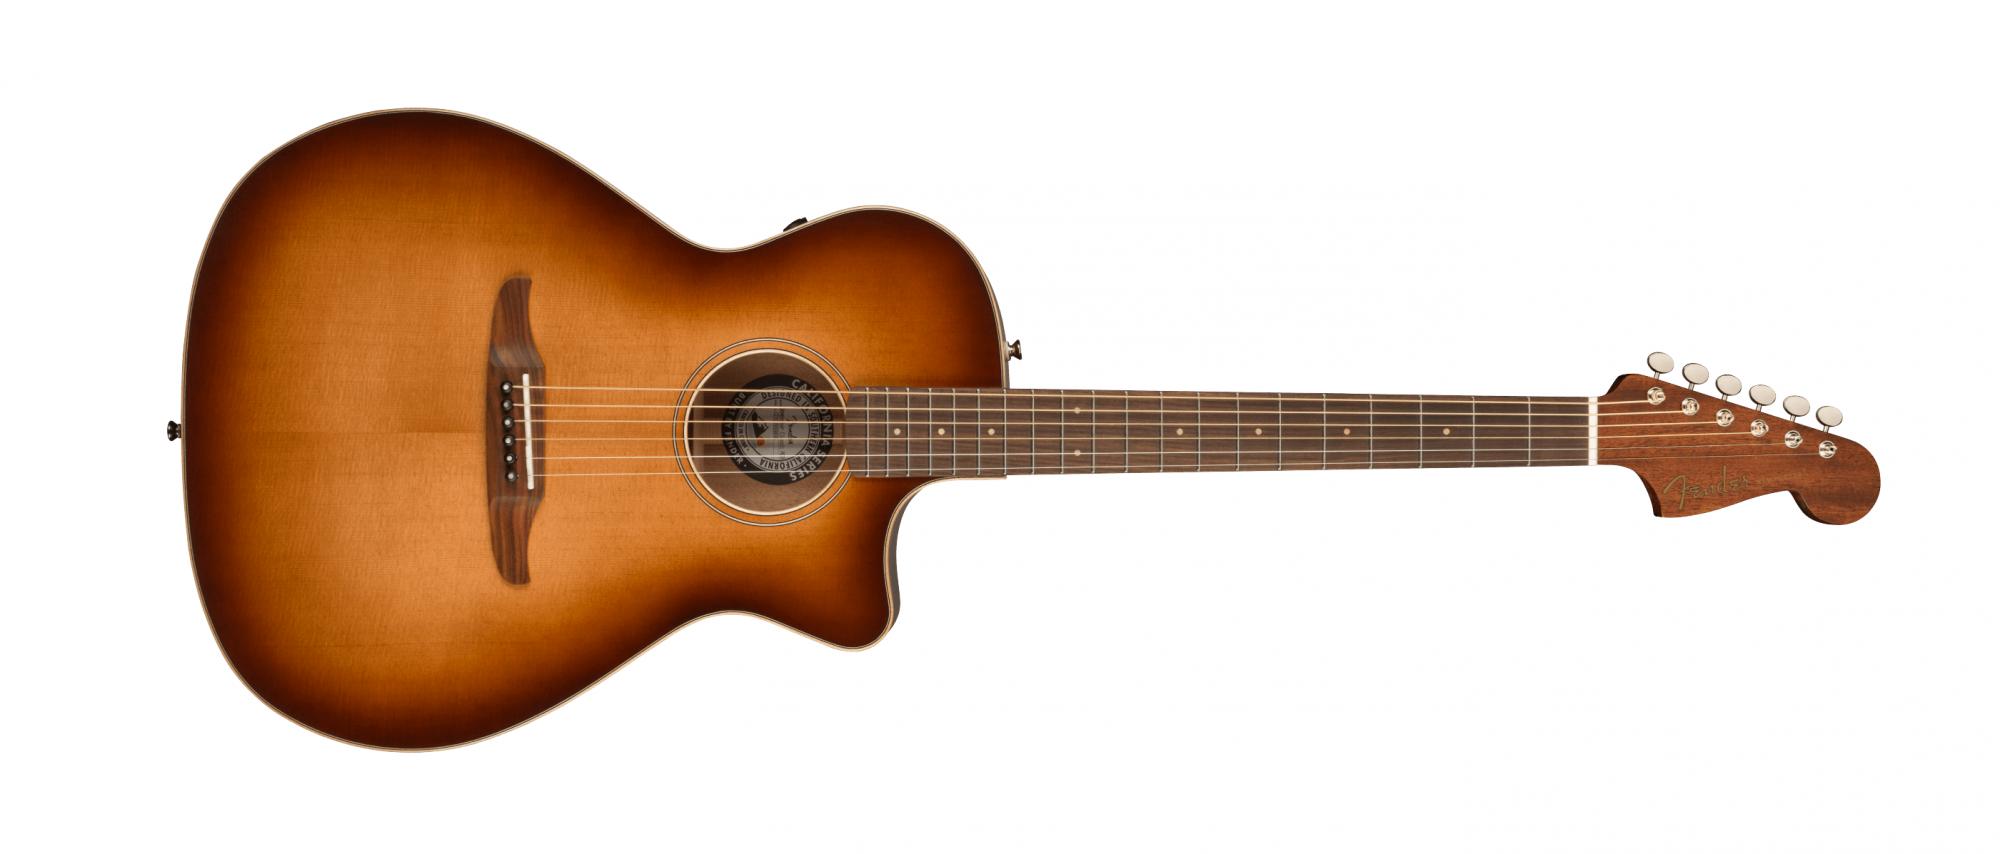 Fender Newporter Classic Acoustic Guitar with Gig Bag, Pau Ferro, Aged Cognac Burst